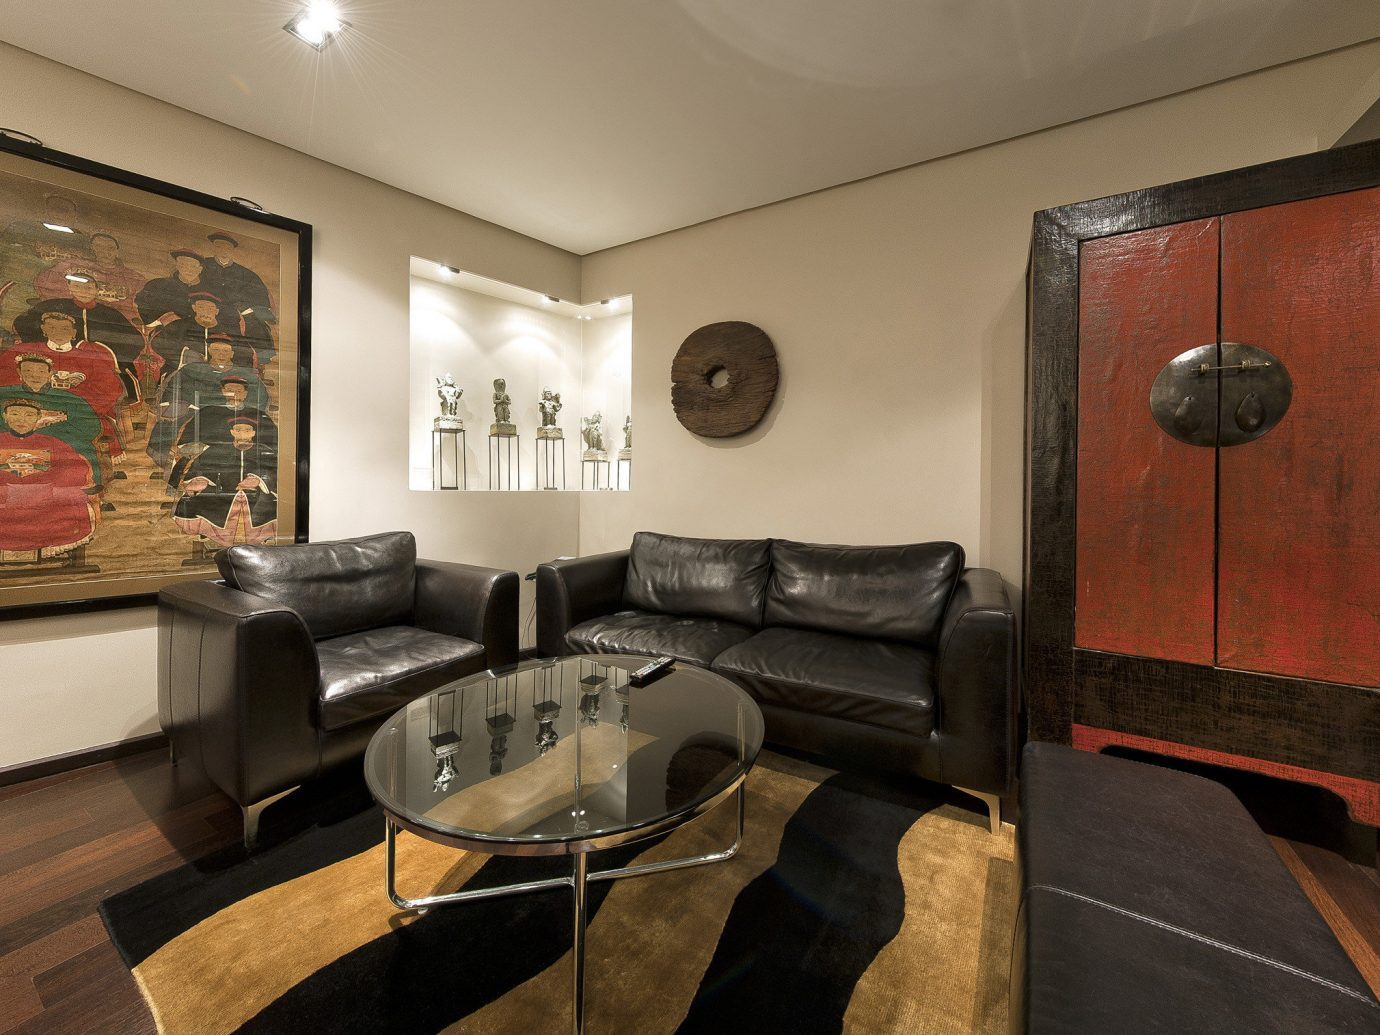 Hotels Madrid Spain indoor floor wall room property living room interior design home estate Suite real estate Design Lobby furniture